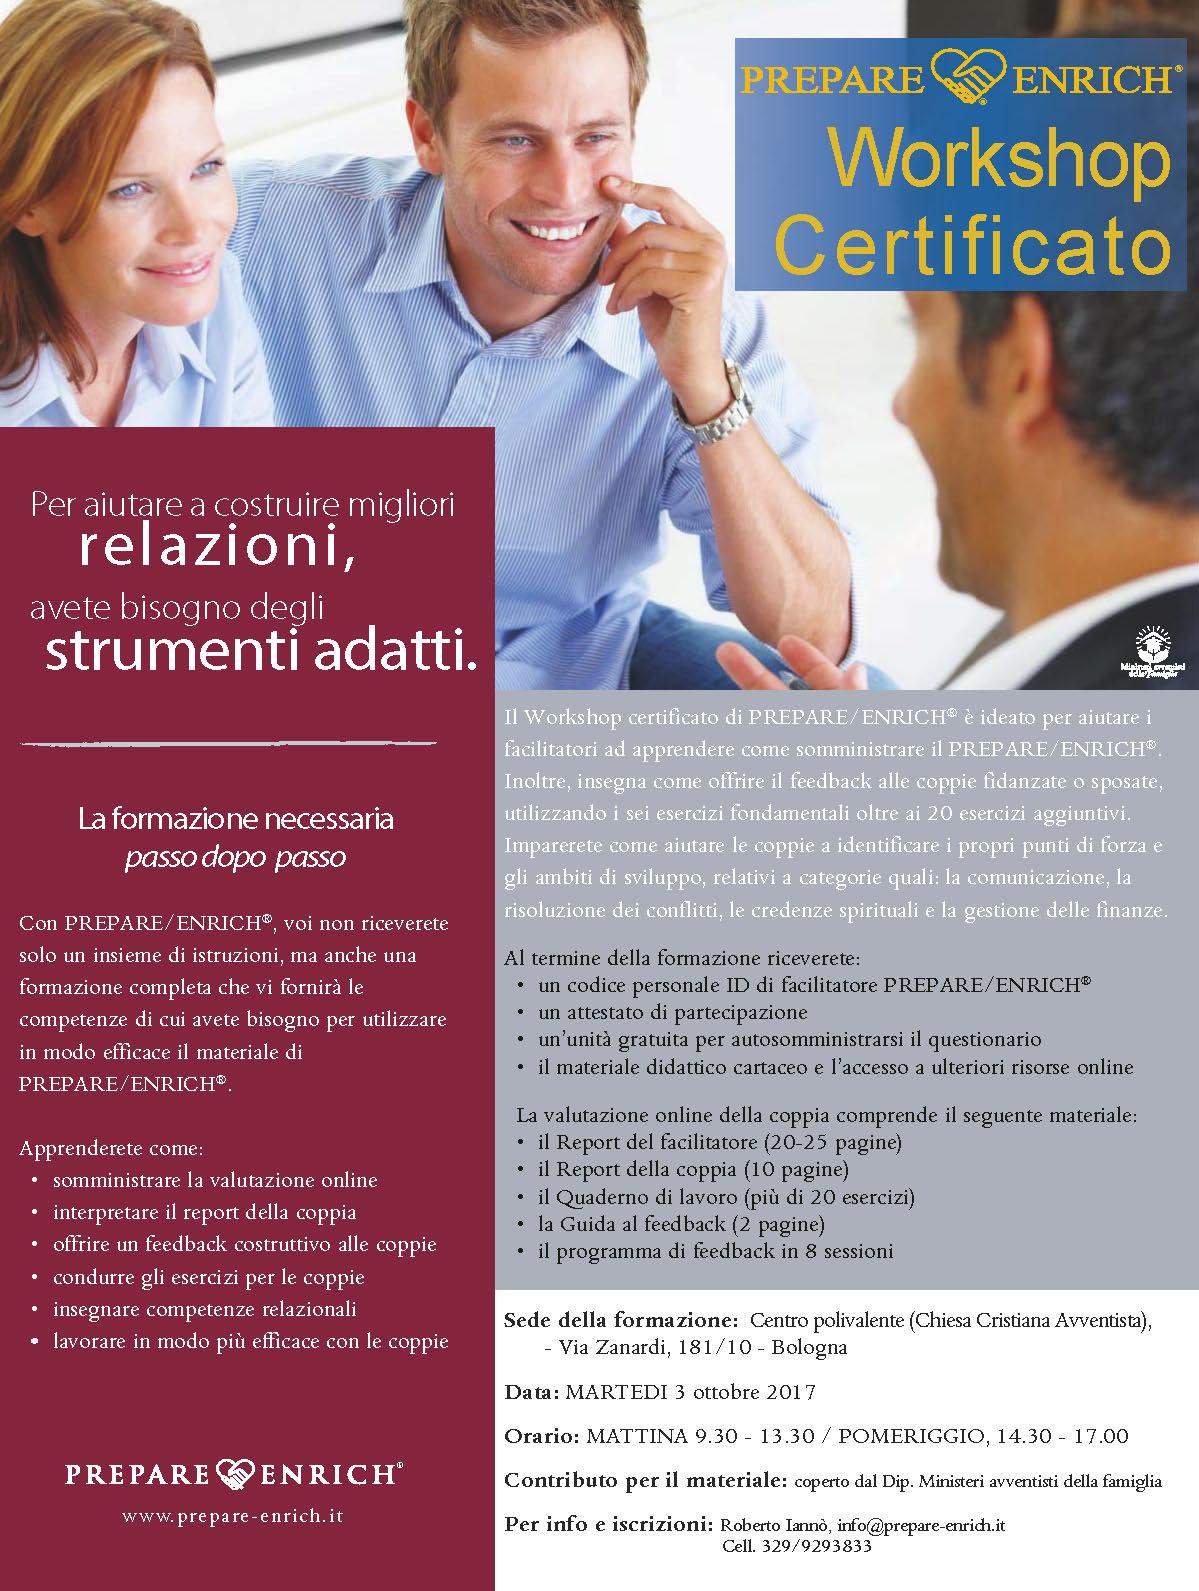 Workshop Certificato, ottobre 2017